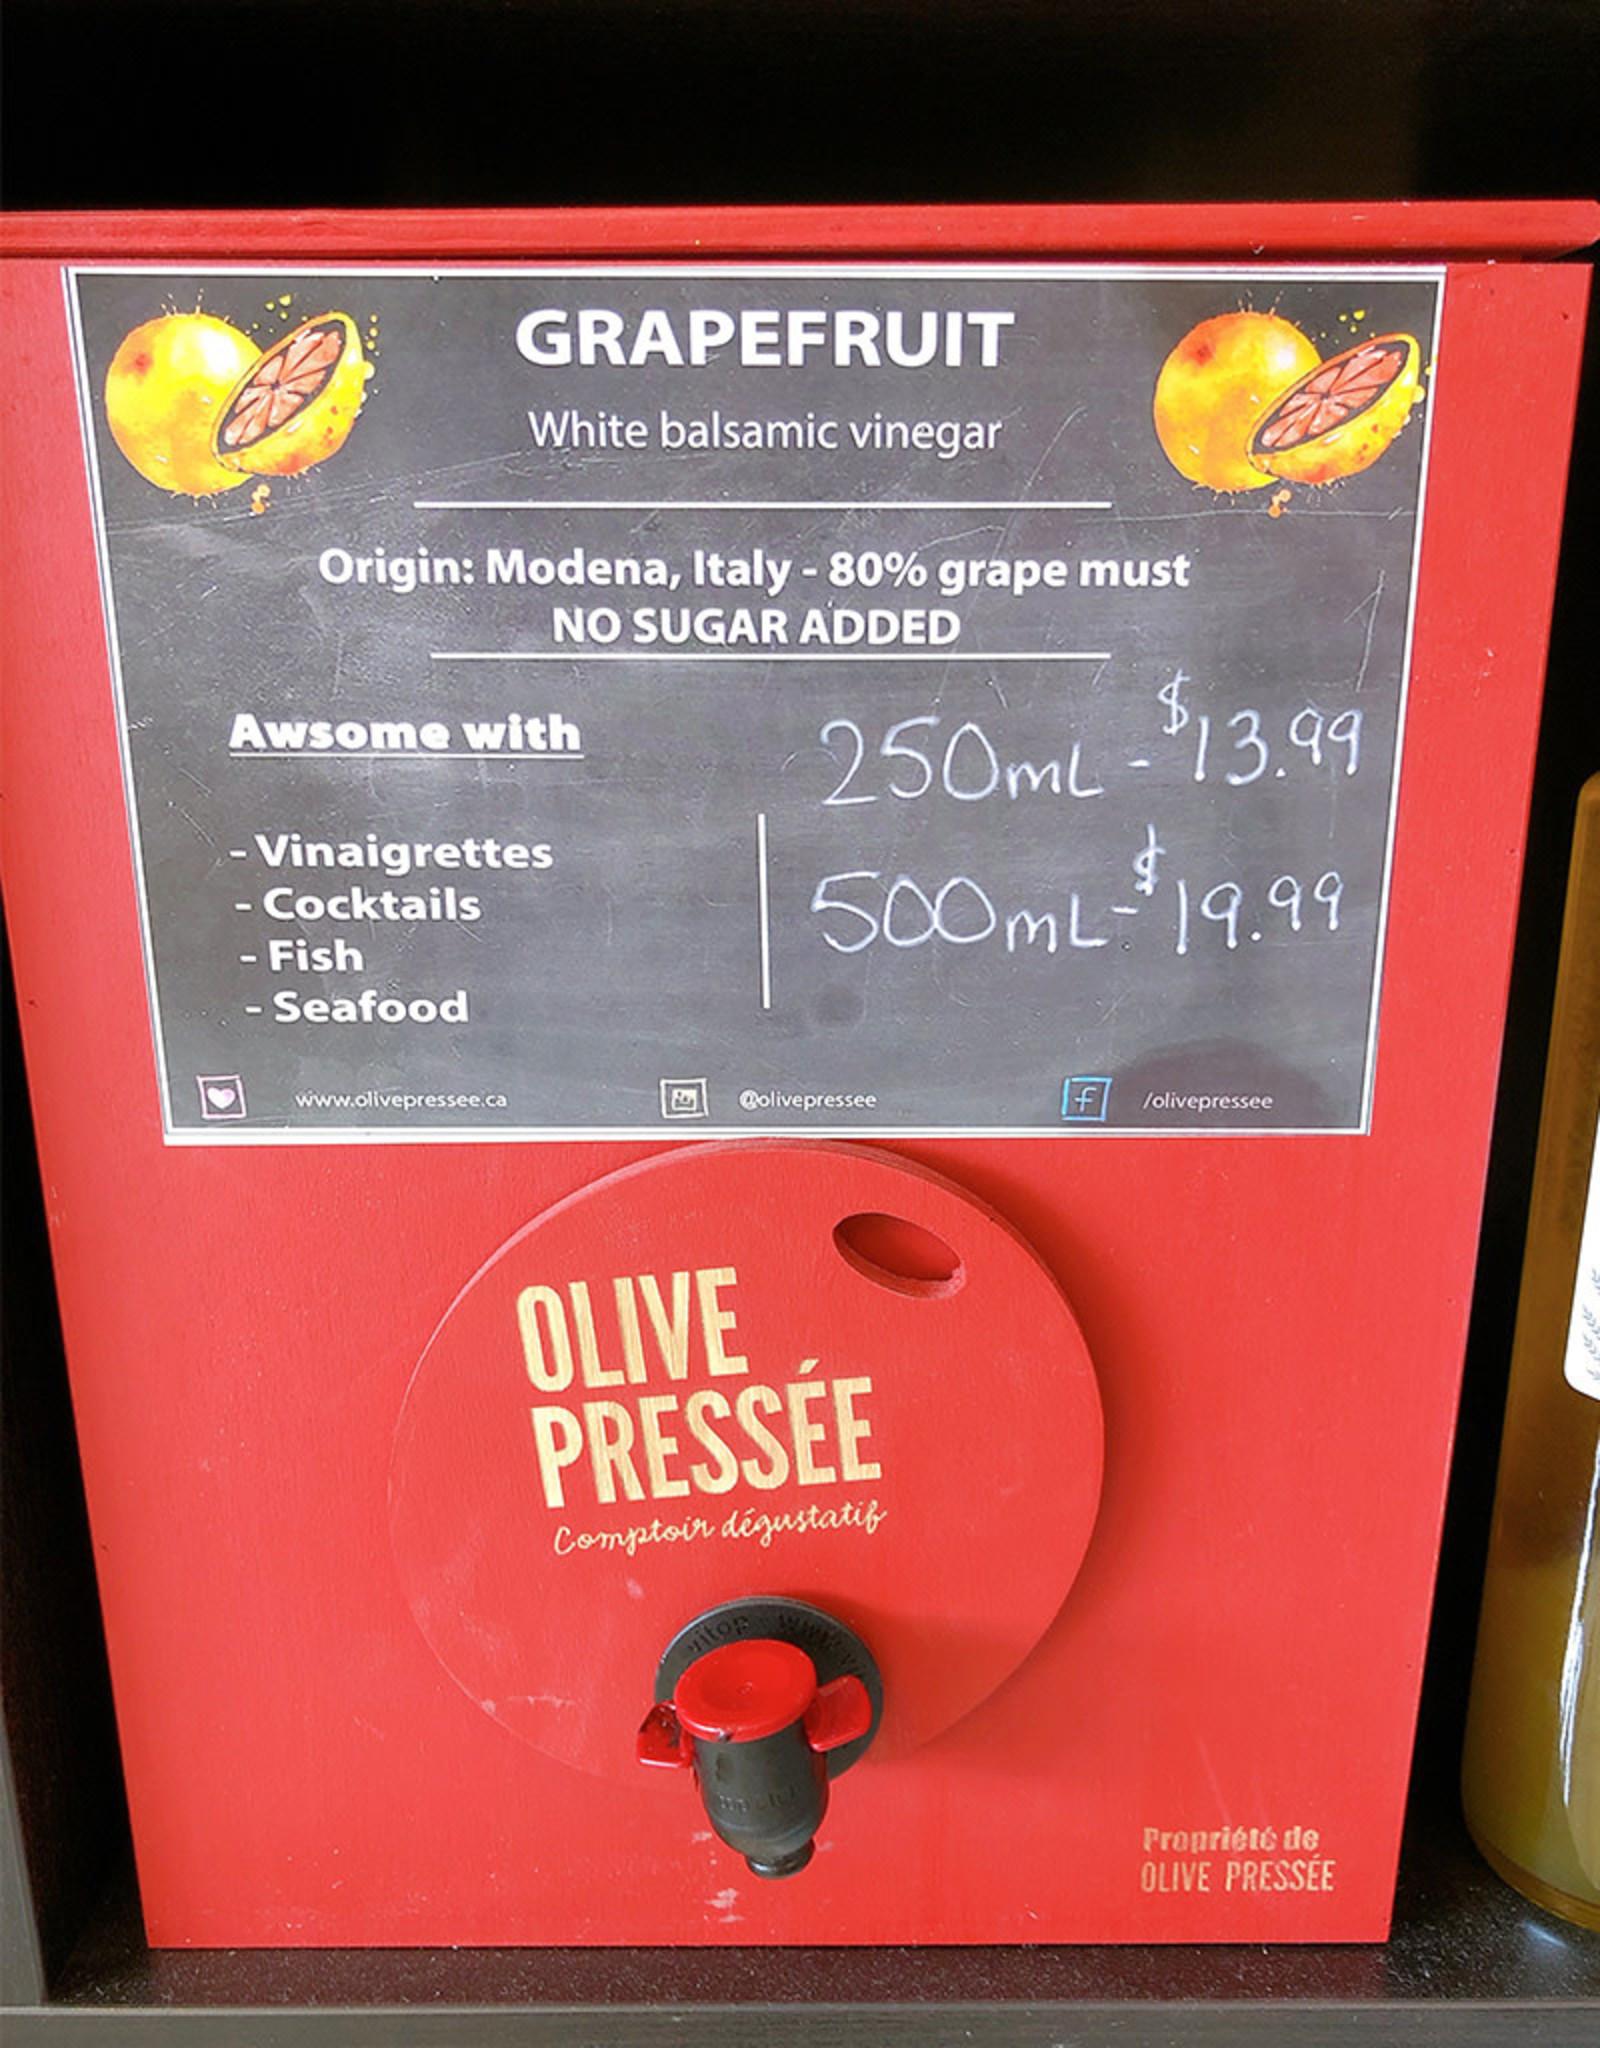 Olive Pressee Olive Pressee - Grapefruit White Balsamic, 500ml